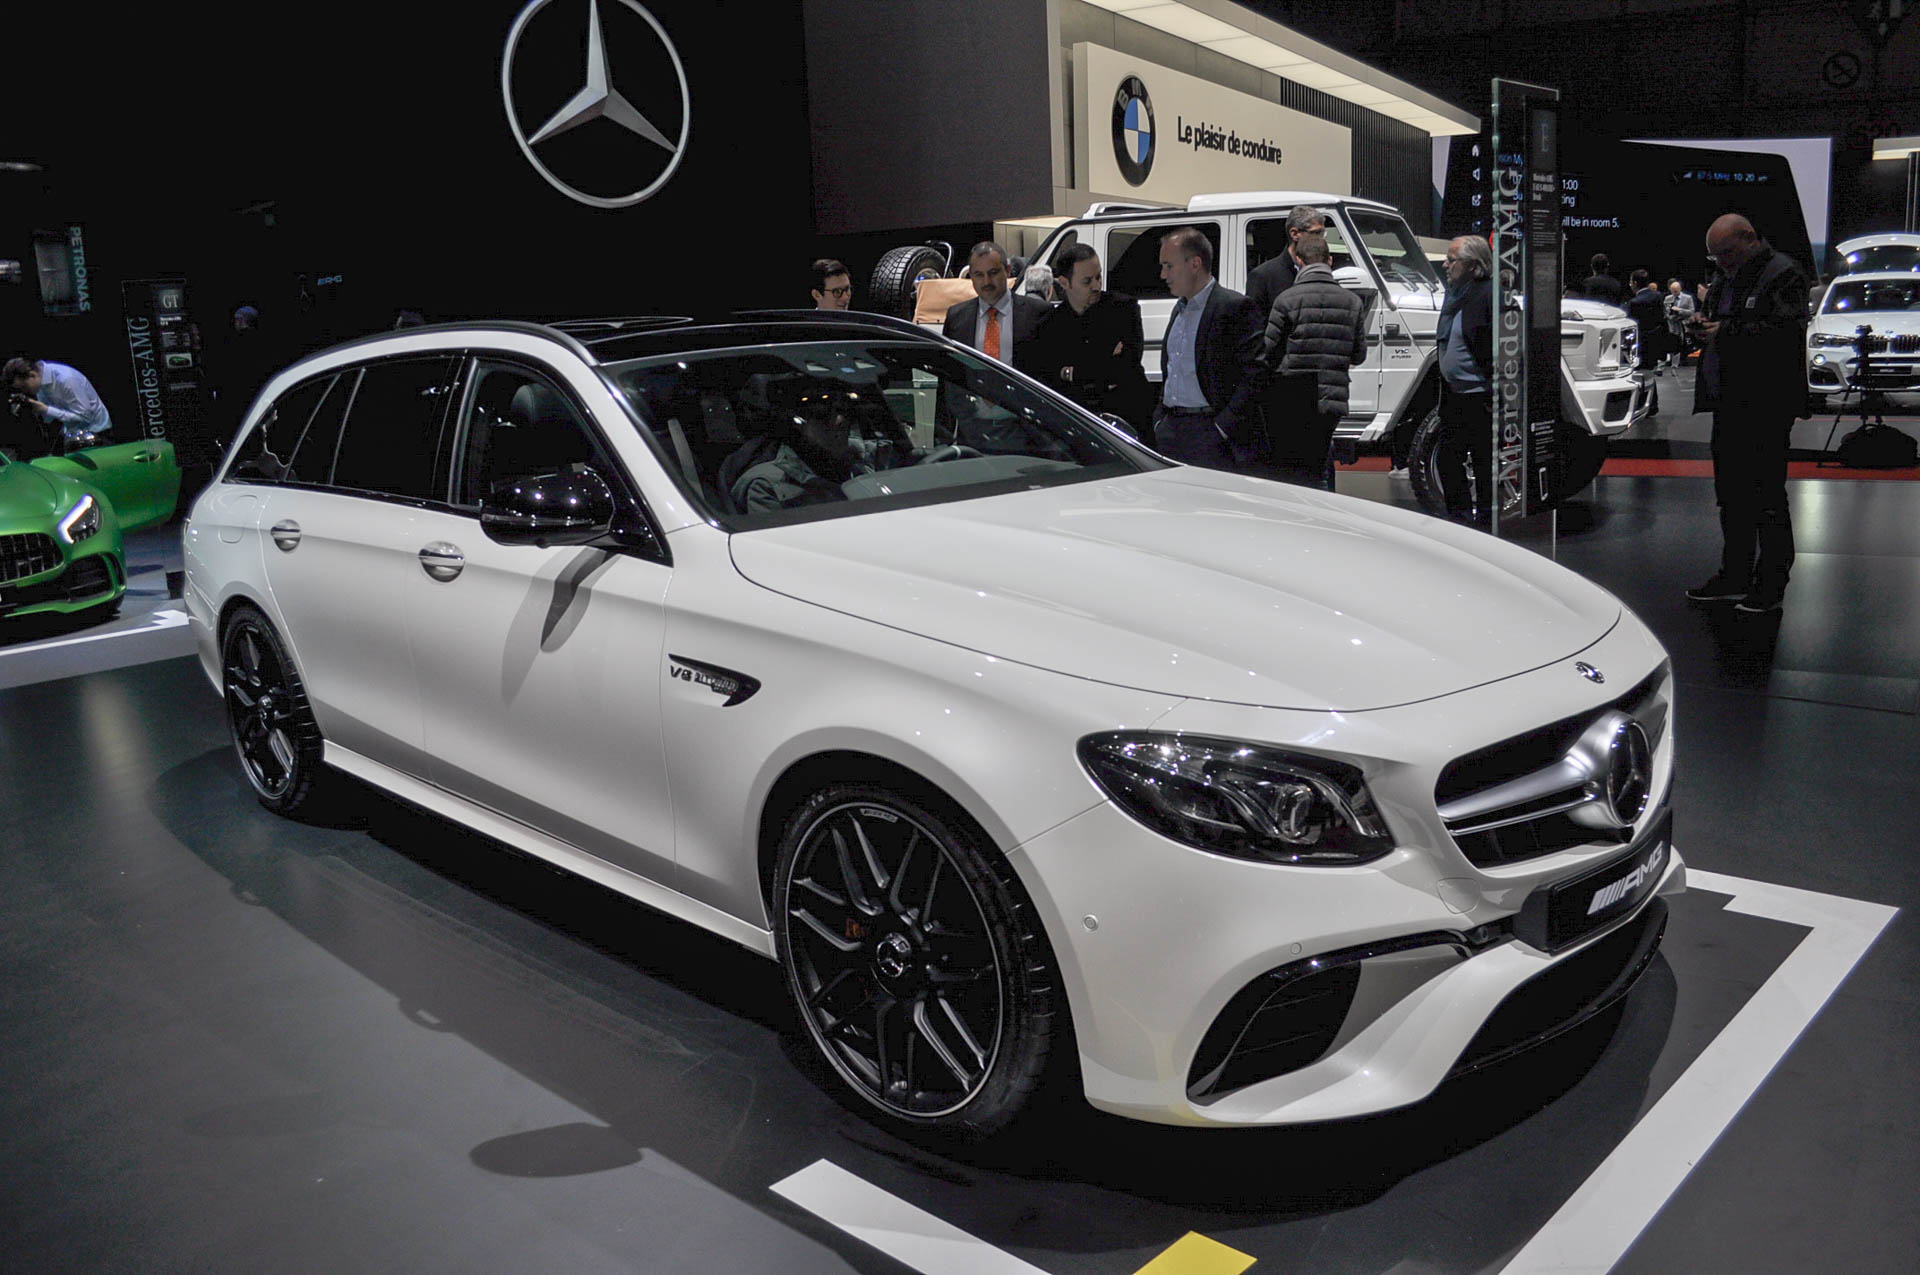 Mercedes-AMG unveils 603-hp 2018 E63 S wagon